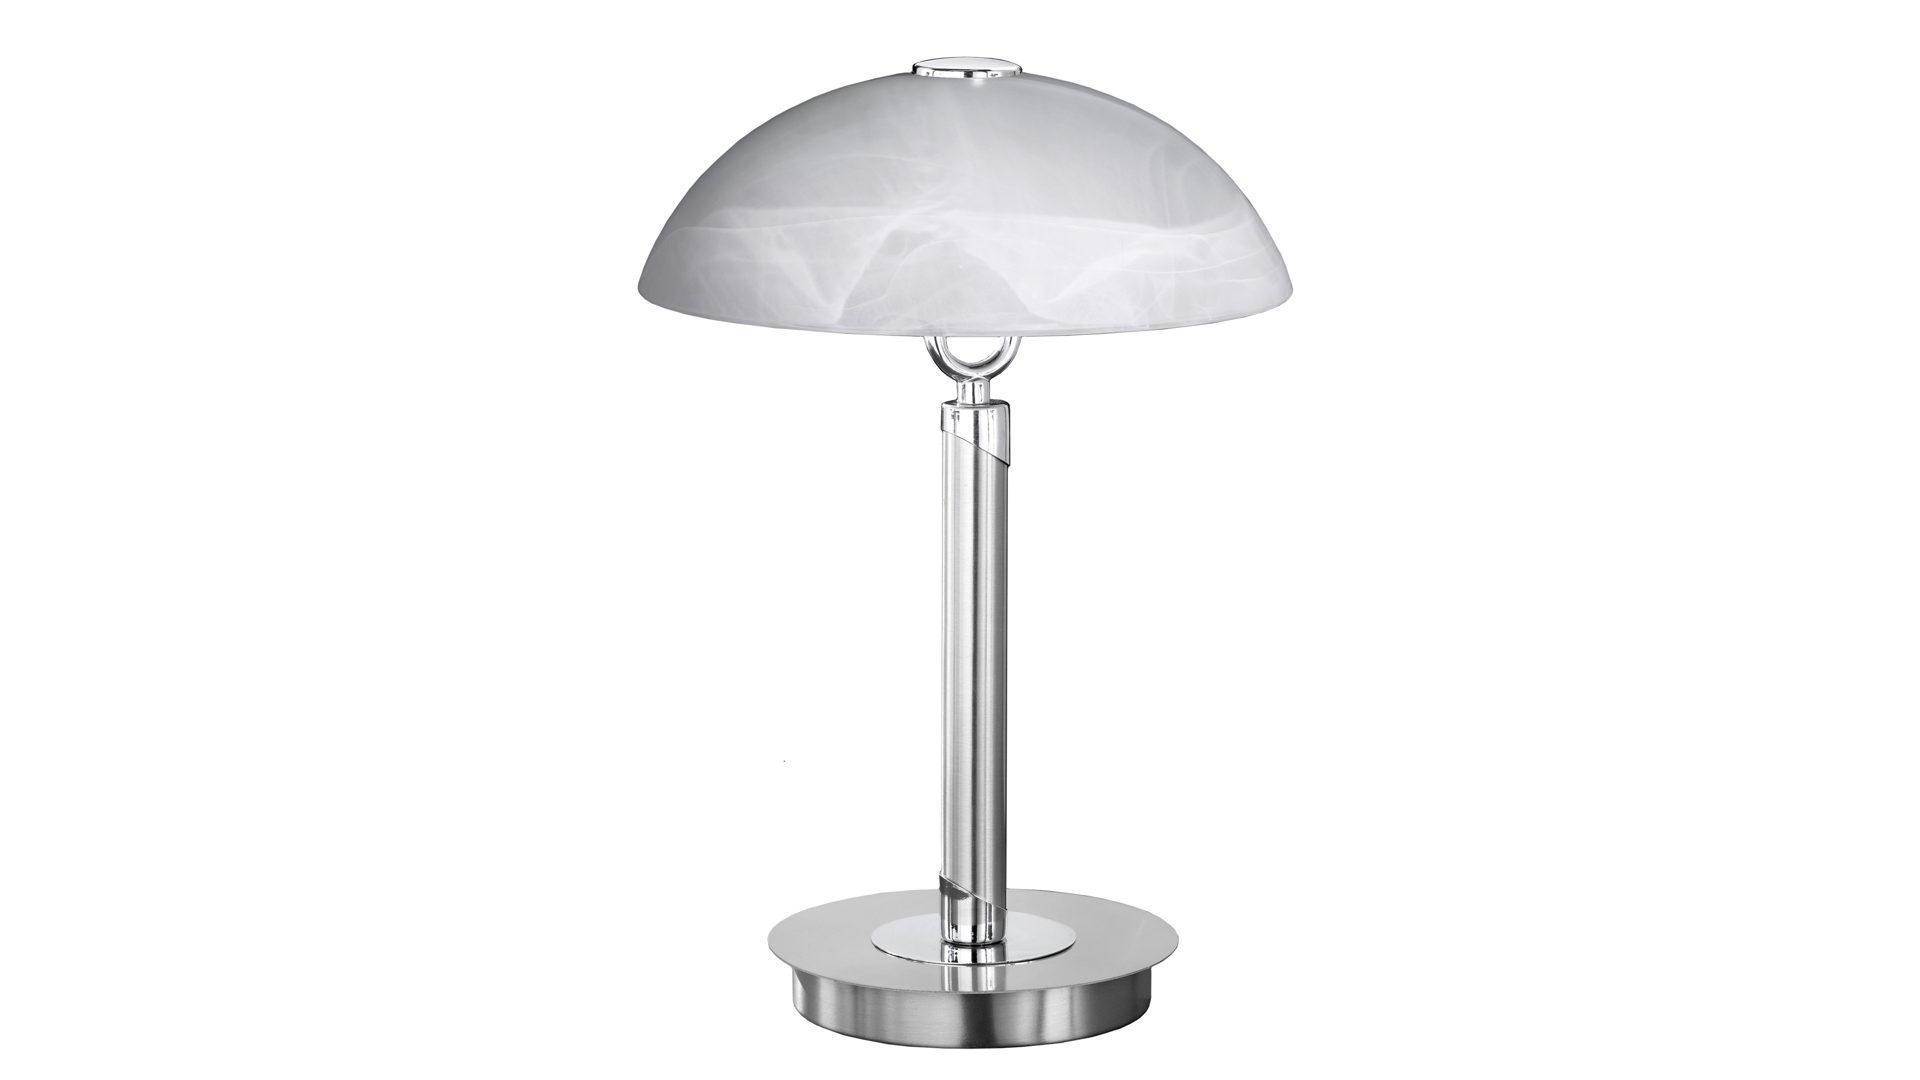 Glas Lampenschirm Fischer Leuchten M6 27300 Spot16 Spot18 Glas